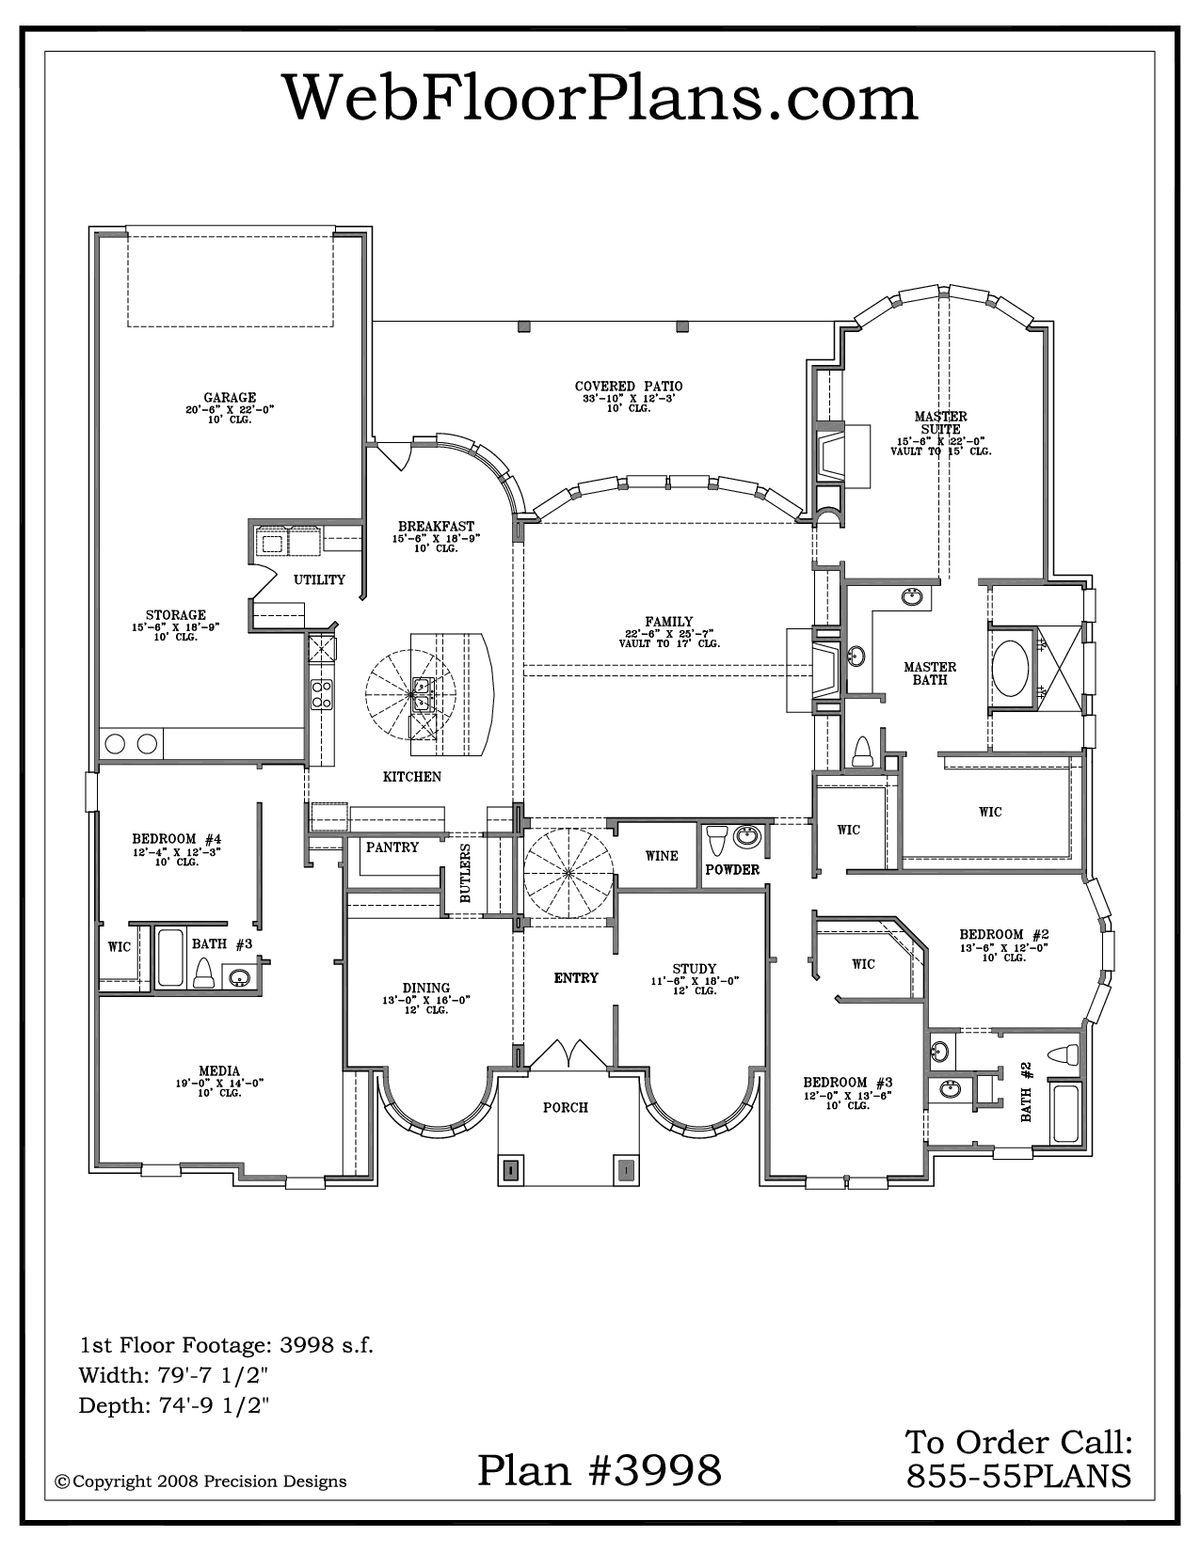 House Plans Barndominium Floor Plans House Plans One Story House Floor Plans